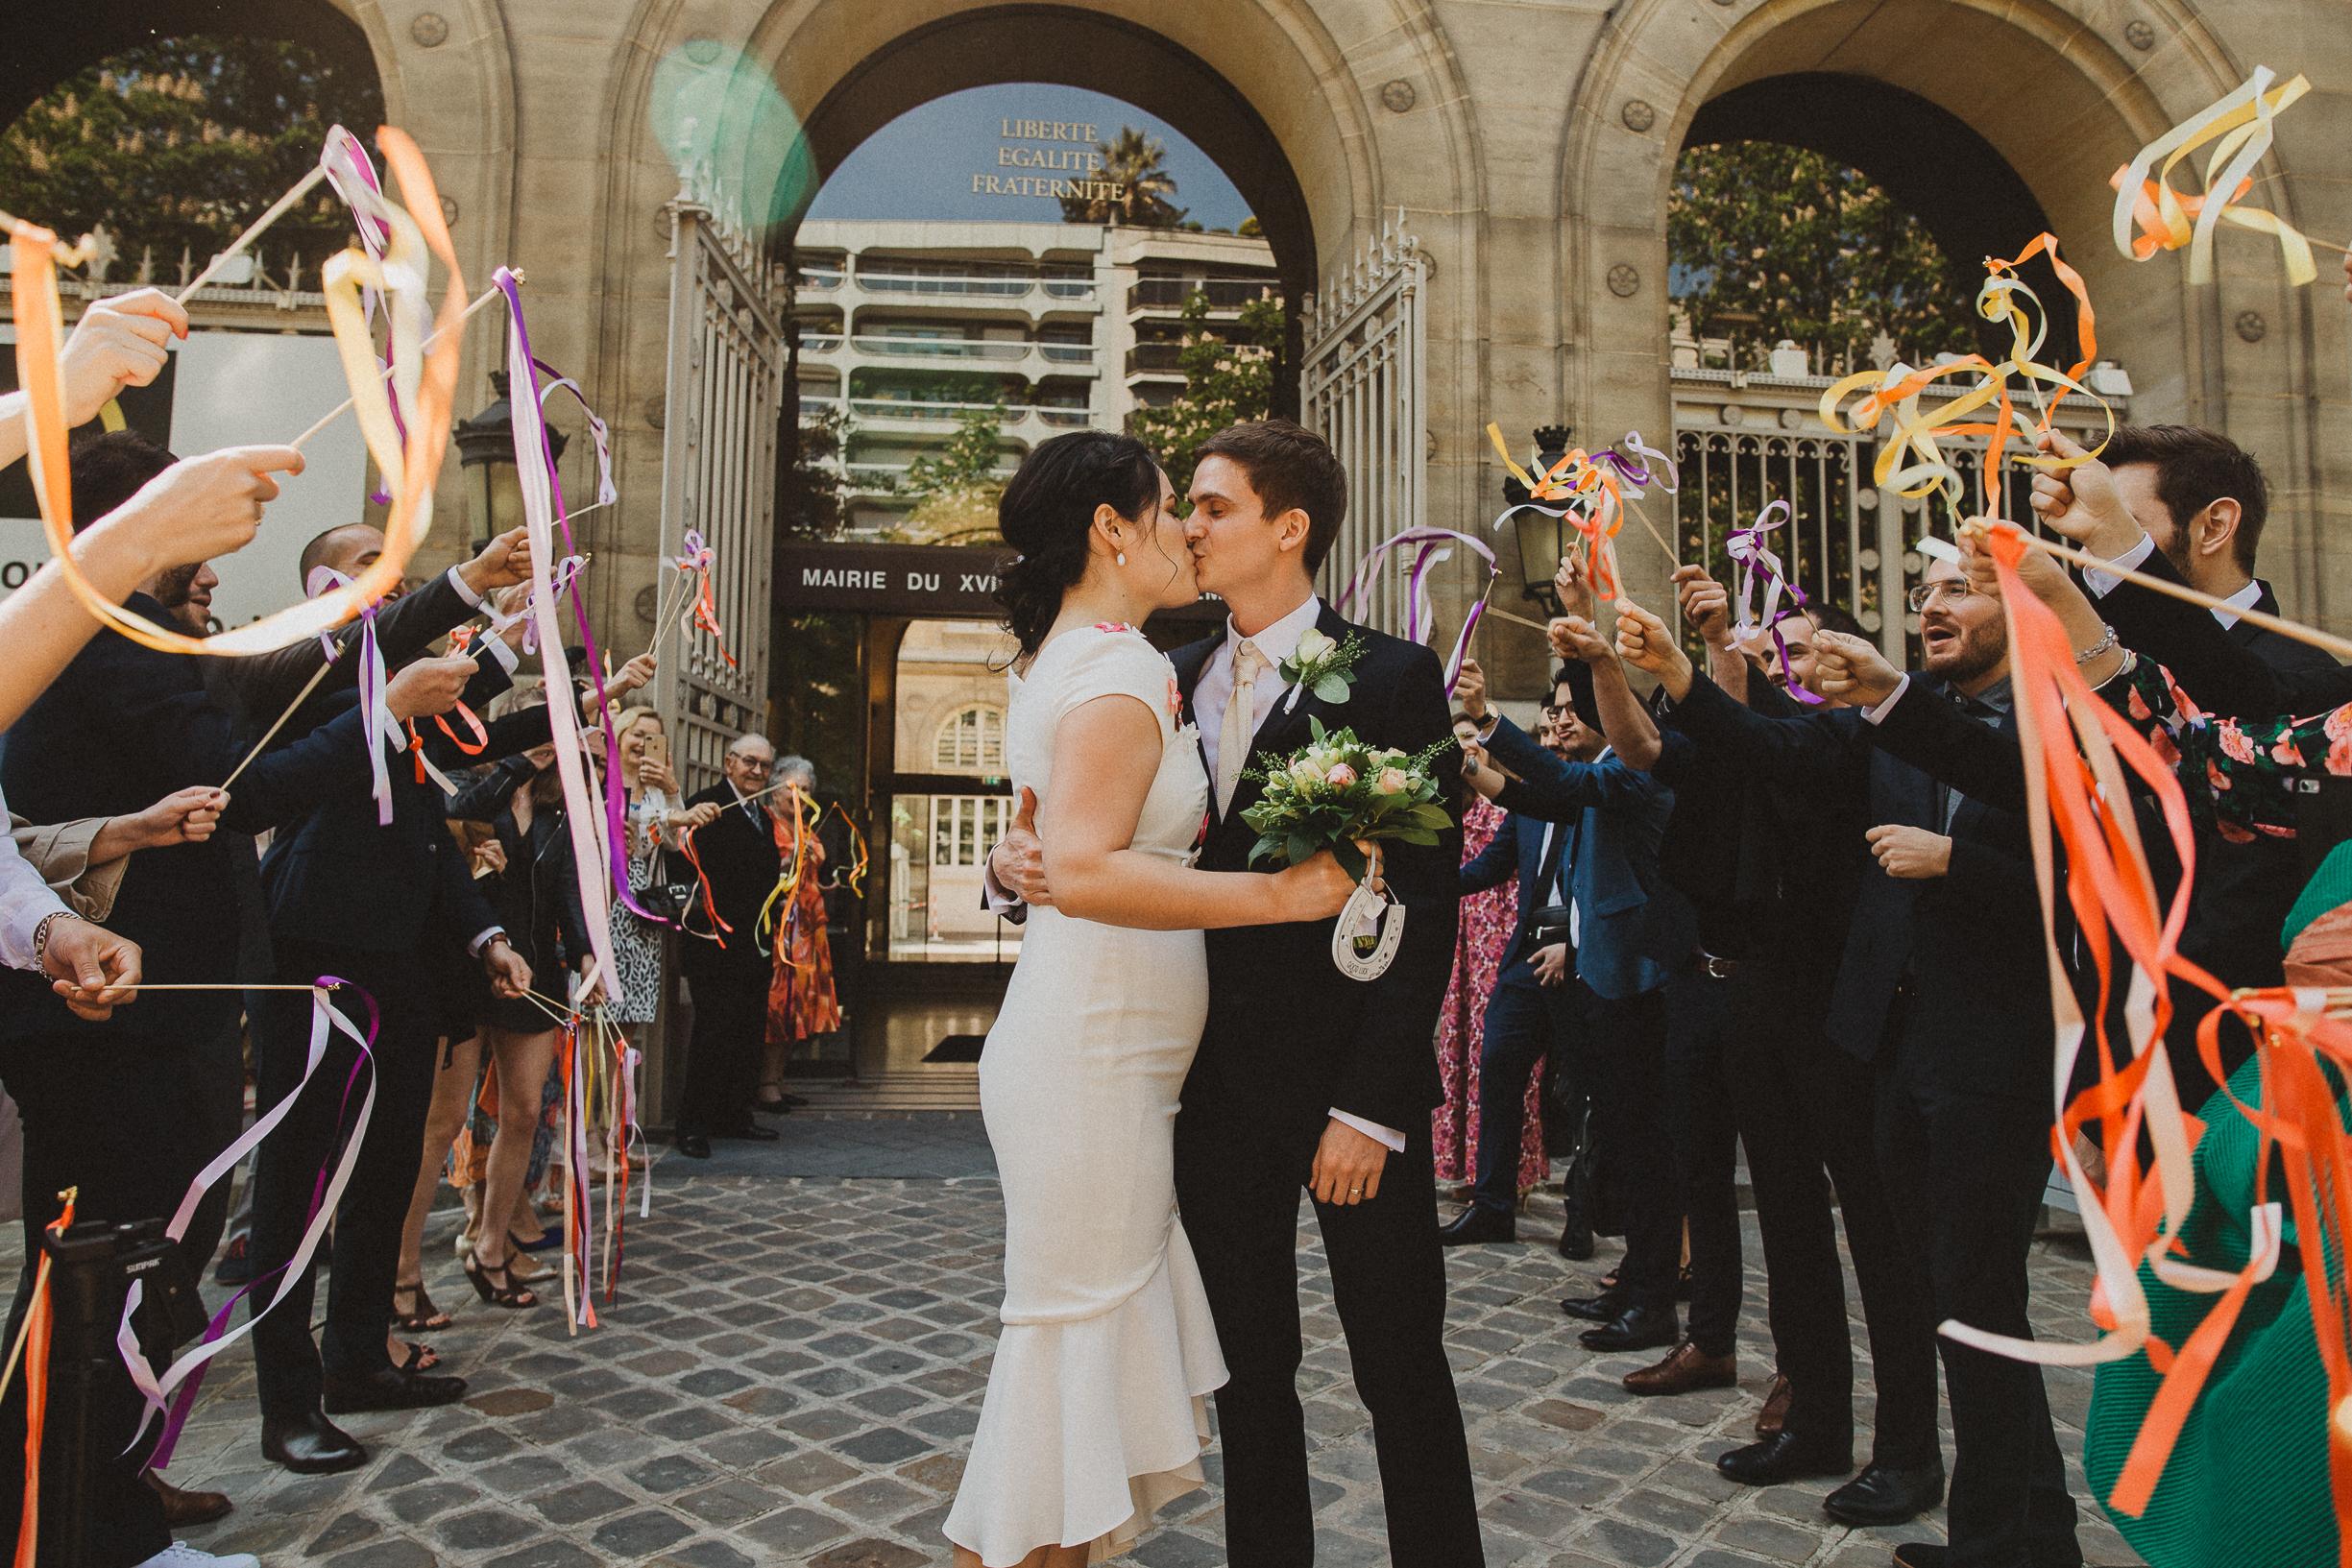 wedding marie 16e photo civil ceremonie